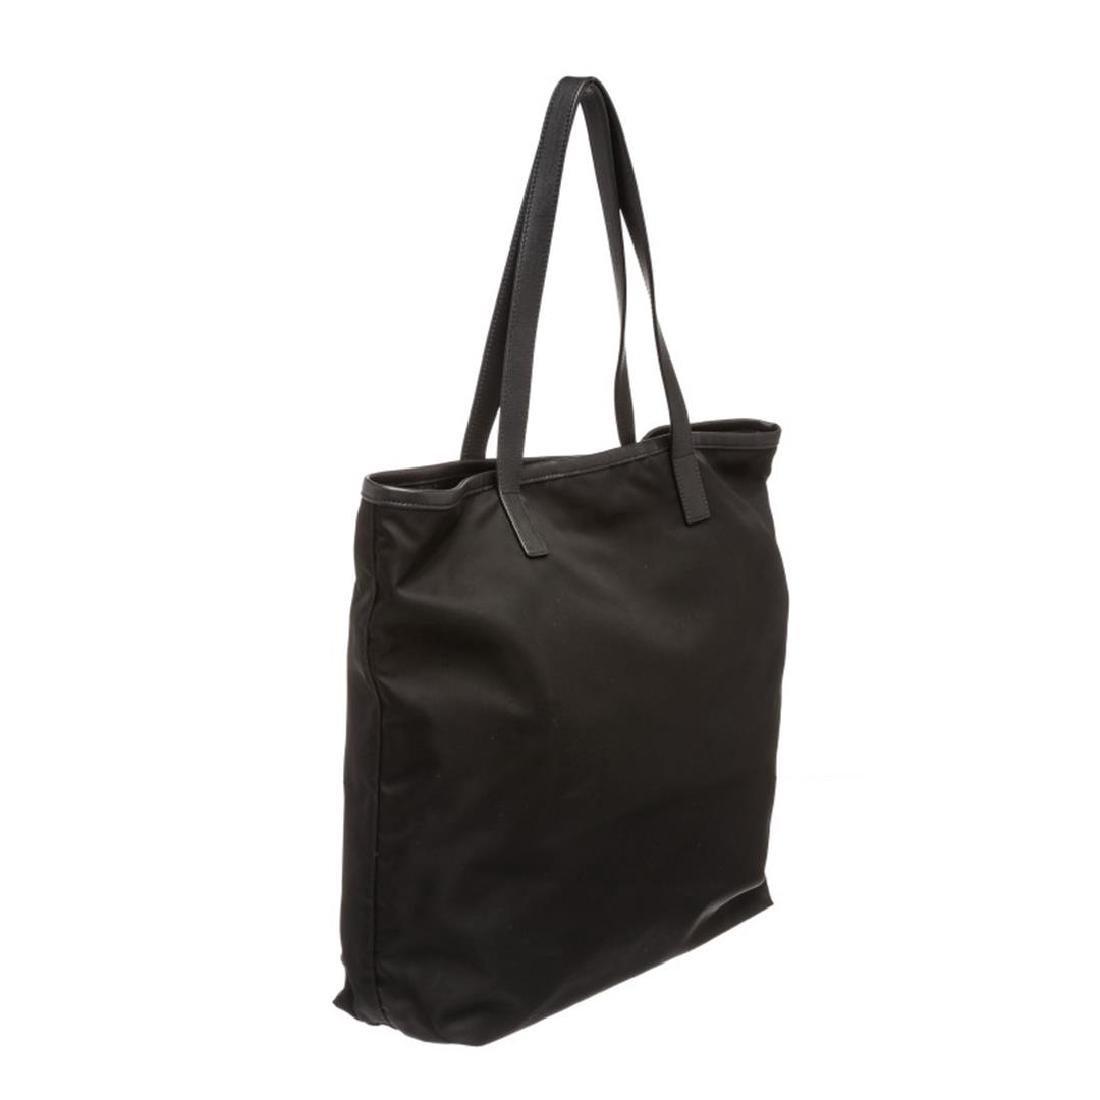 Prada Black Nylon Leather Long Tote Shoulder Bag - 3